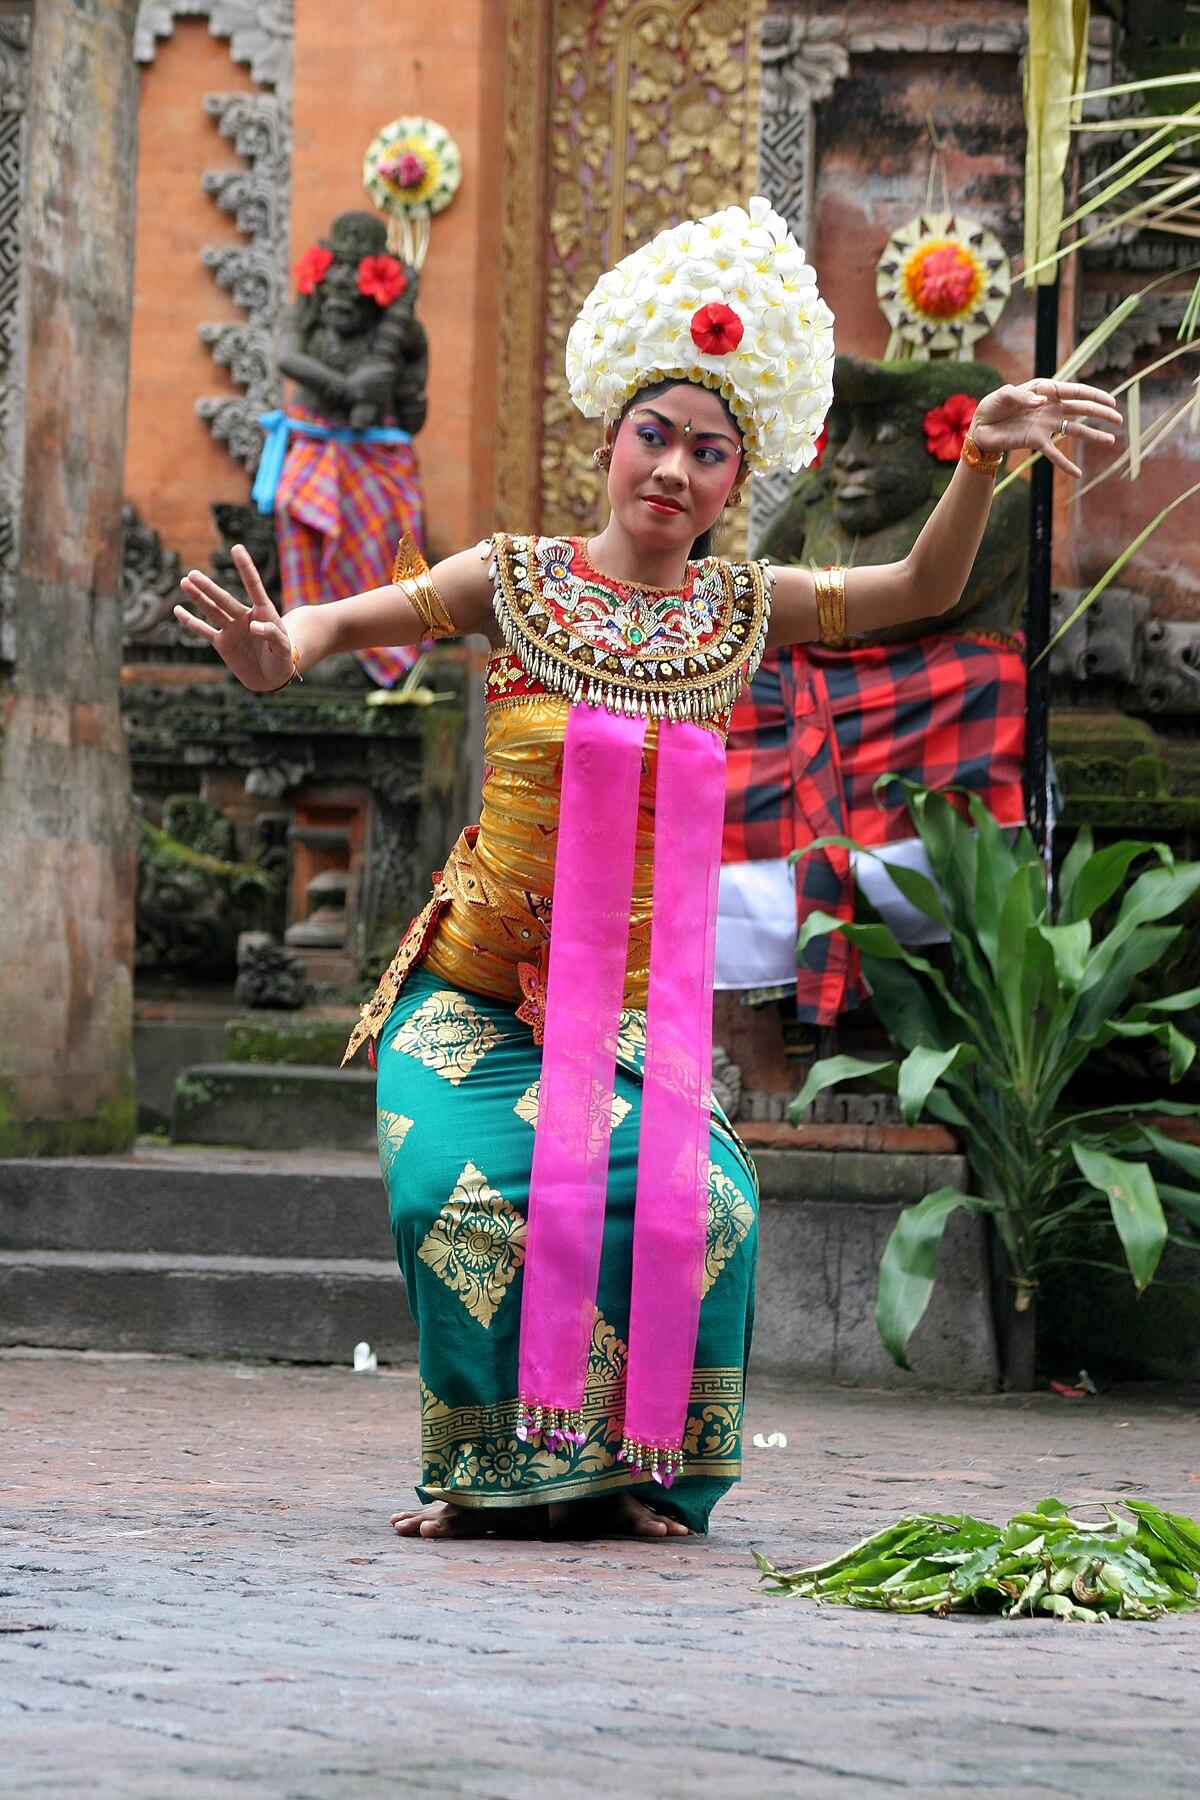 Tari Tarian Nusantara : tarian, nusantara, Tarian, Indonesia, Wikipedia, Bahasa, Indonesia,, Ensiklopedia, Bebas